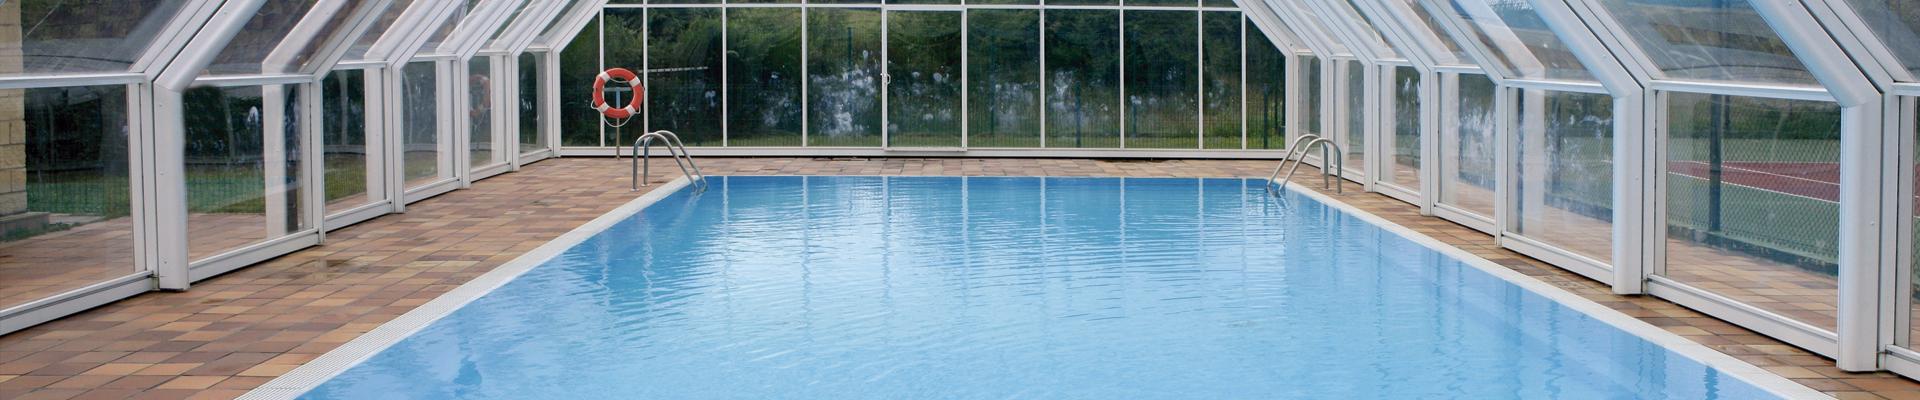 Aquafel- piscinas publicas